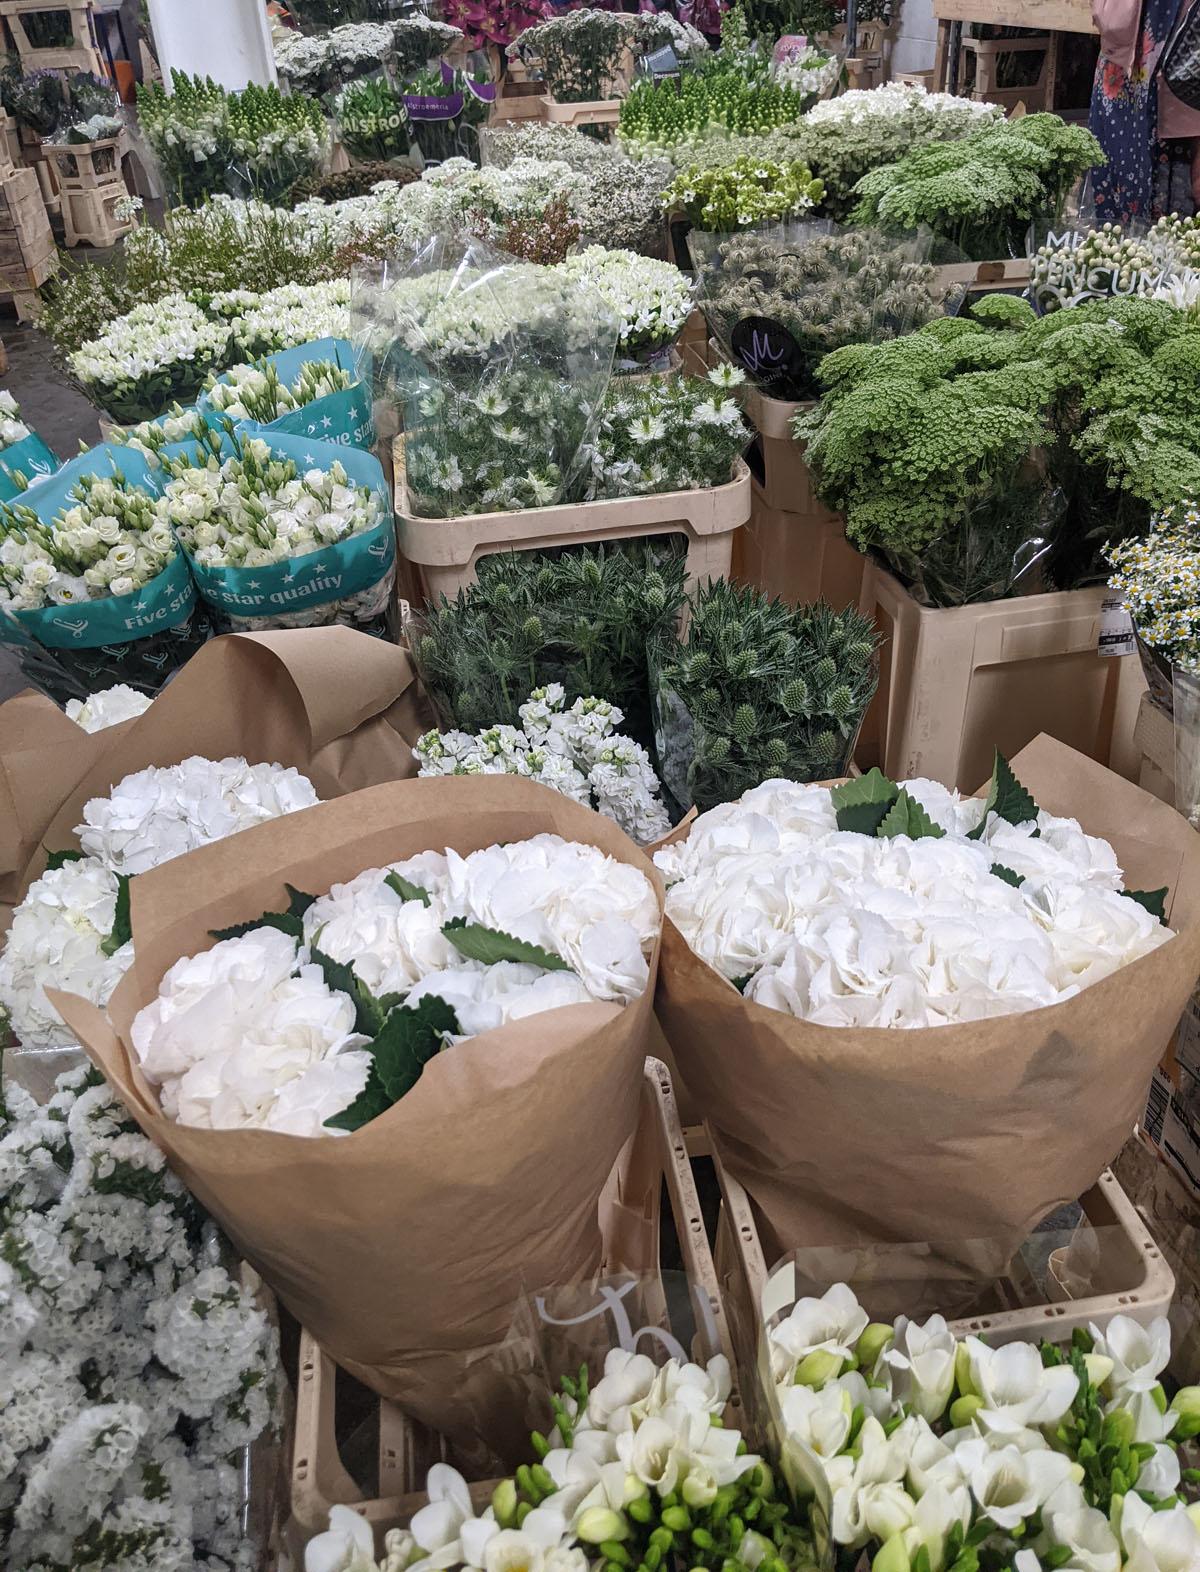 Whites - New Covent Garden Market